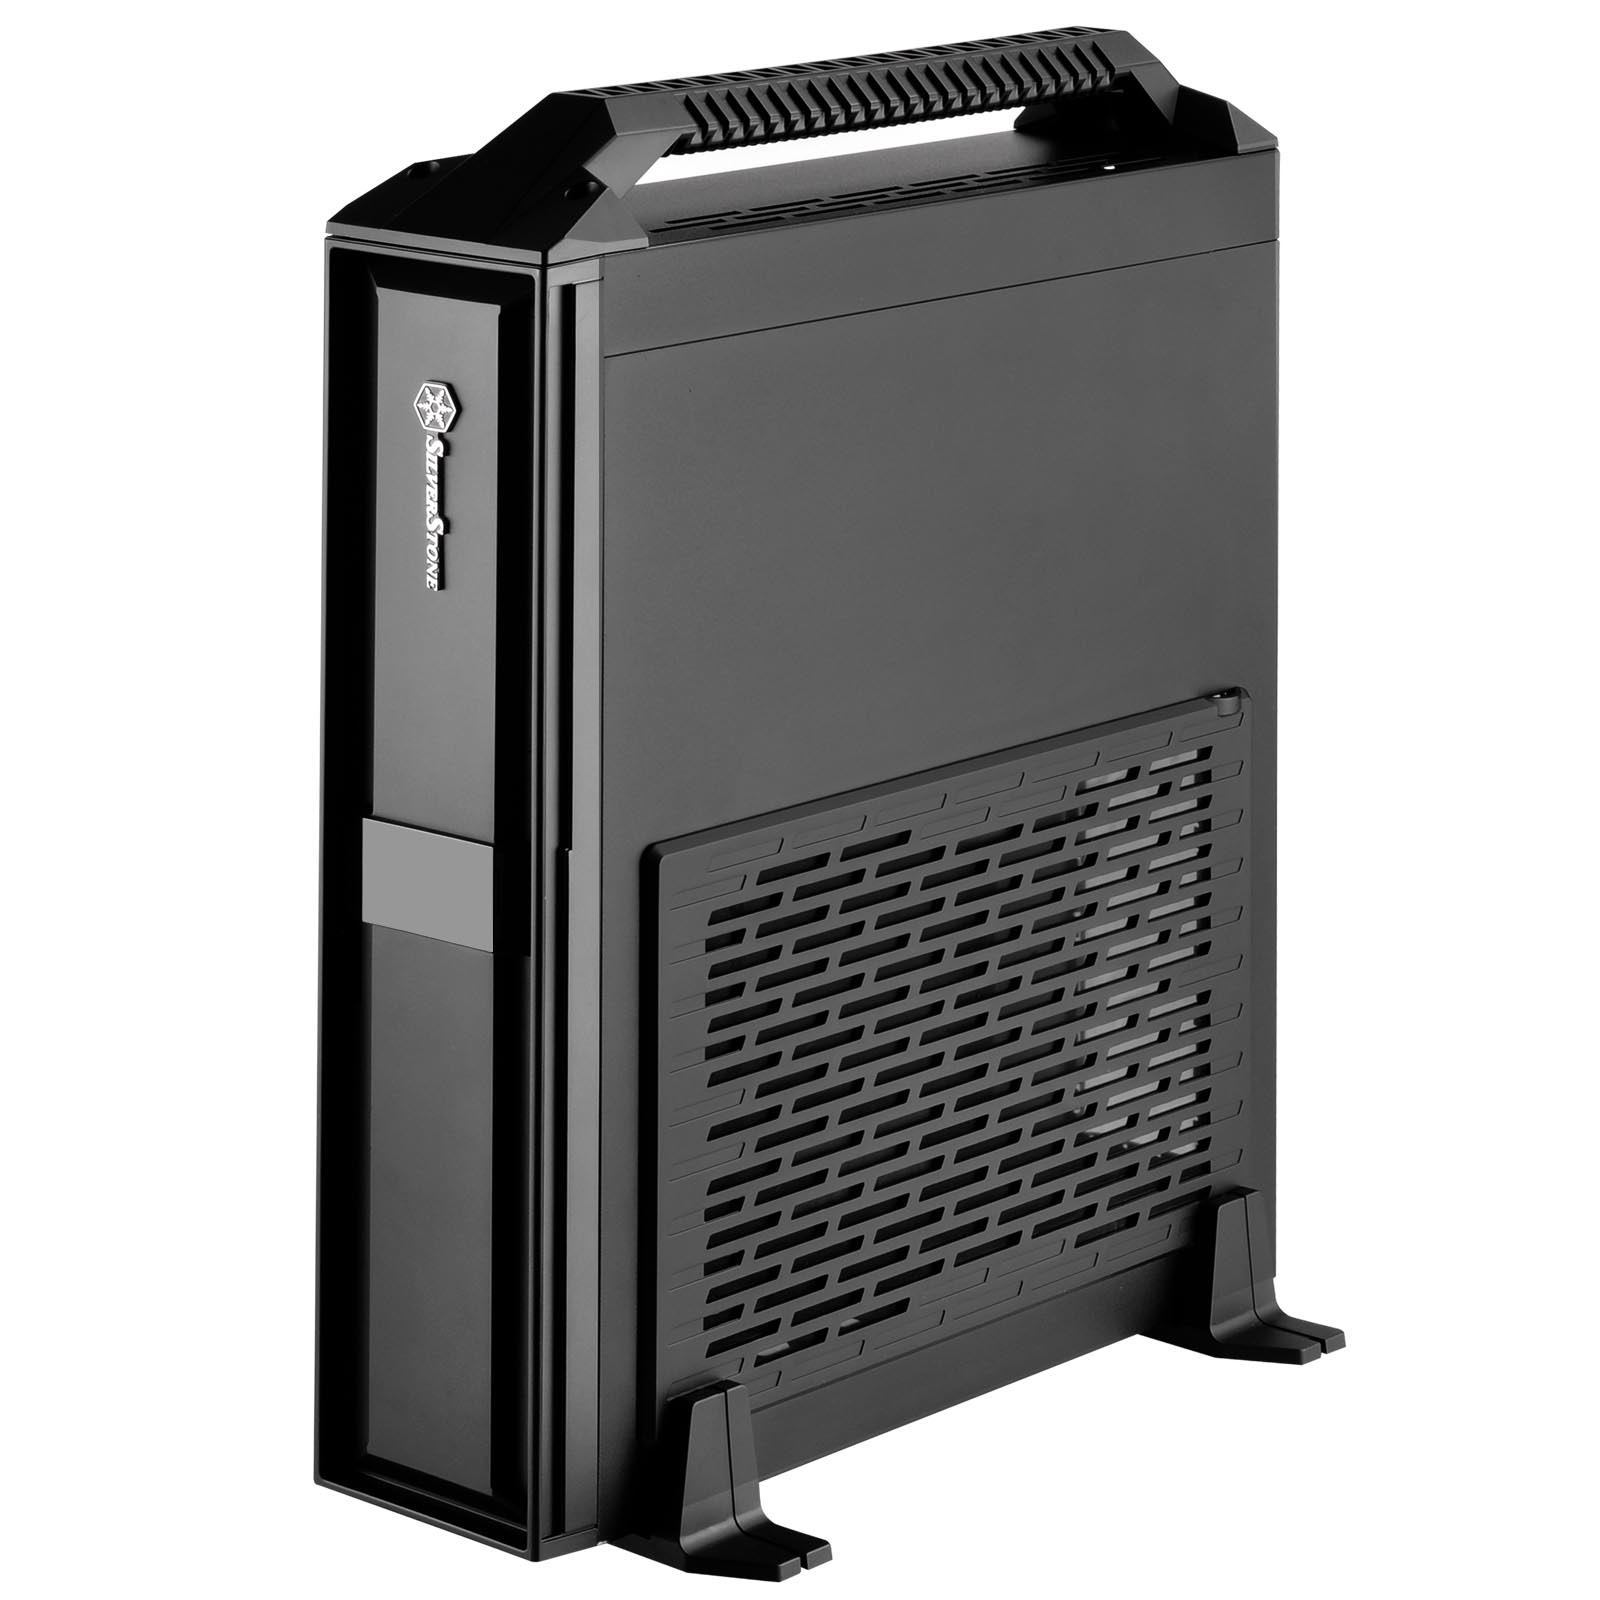 SilverStone  propose un nouveau boitier mini-ITX, le ML08